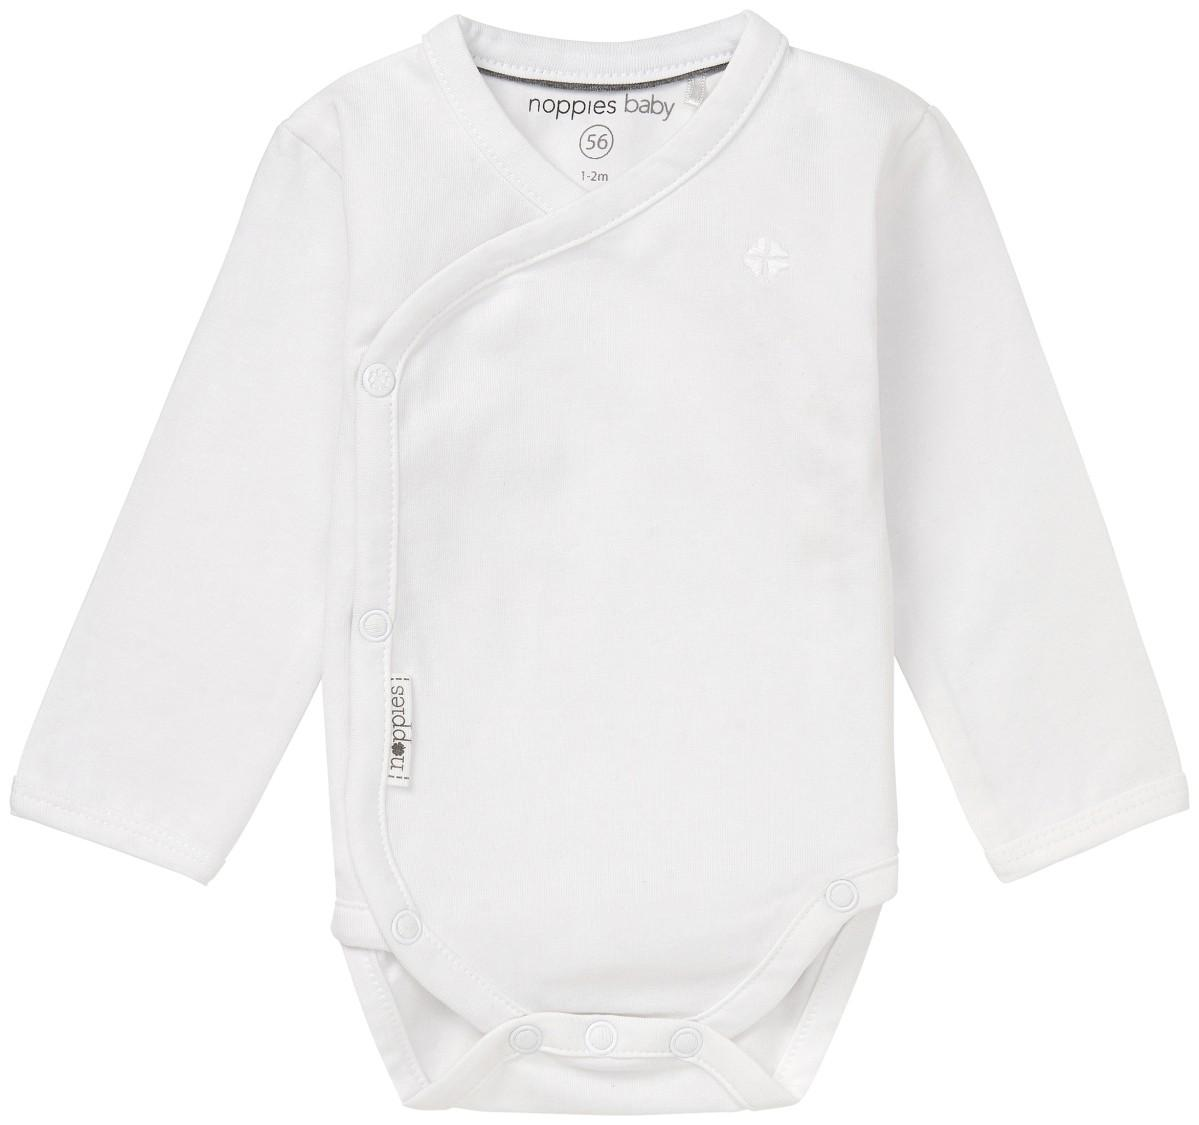 Noppies - Babypakje Ziara White - 1M